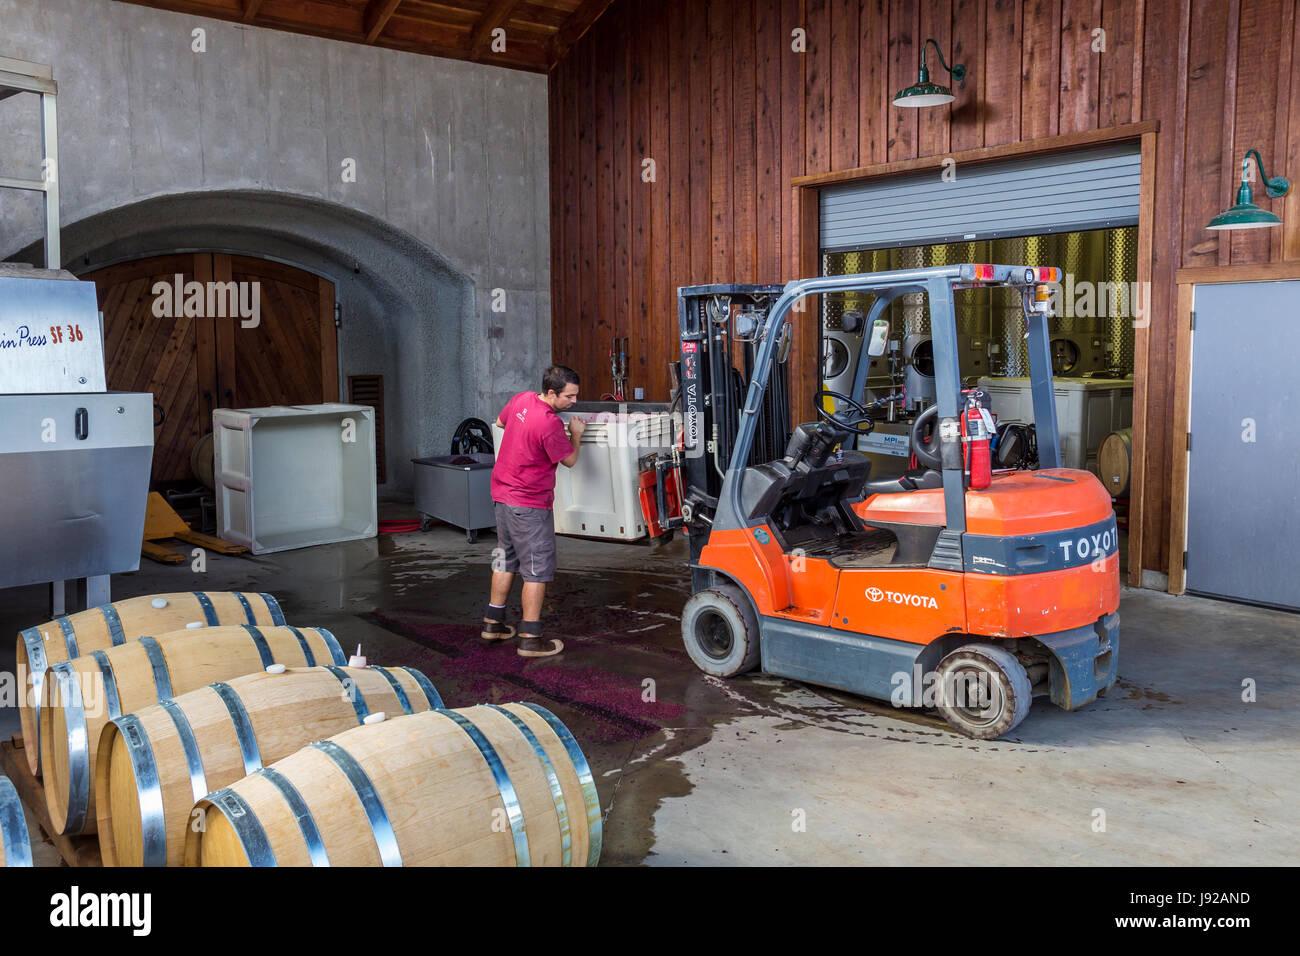 winery worker, Jericho Canyon Vineyard, Calistoga, Napa Valley, California, United States - Stock Image